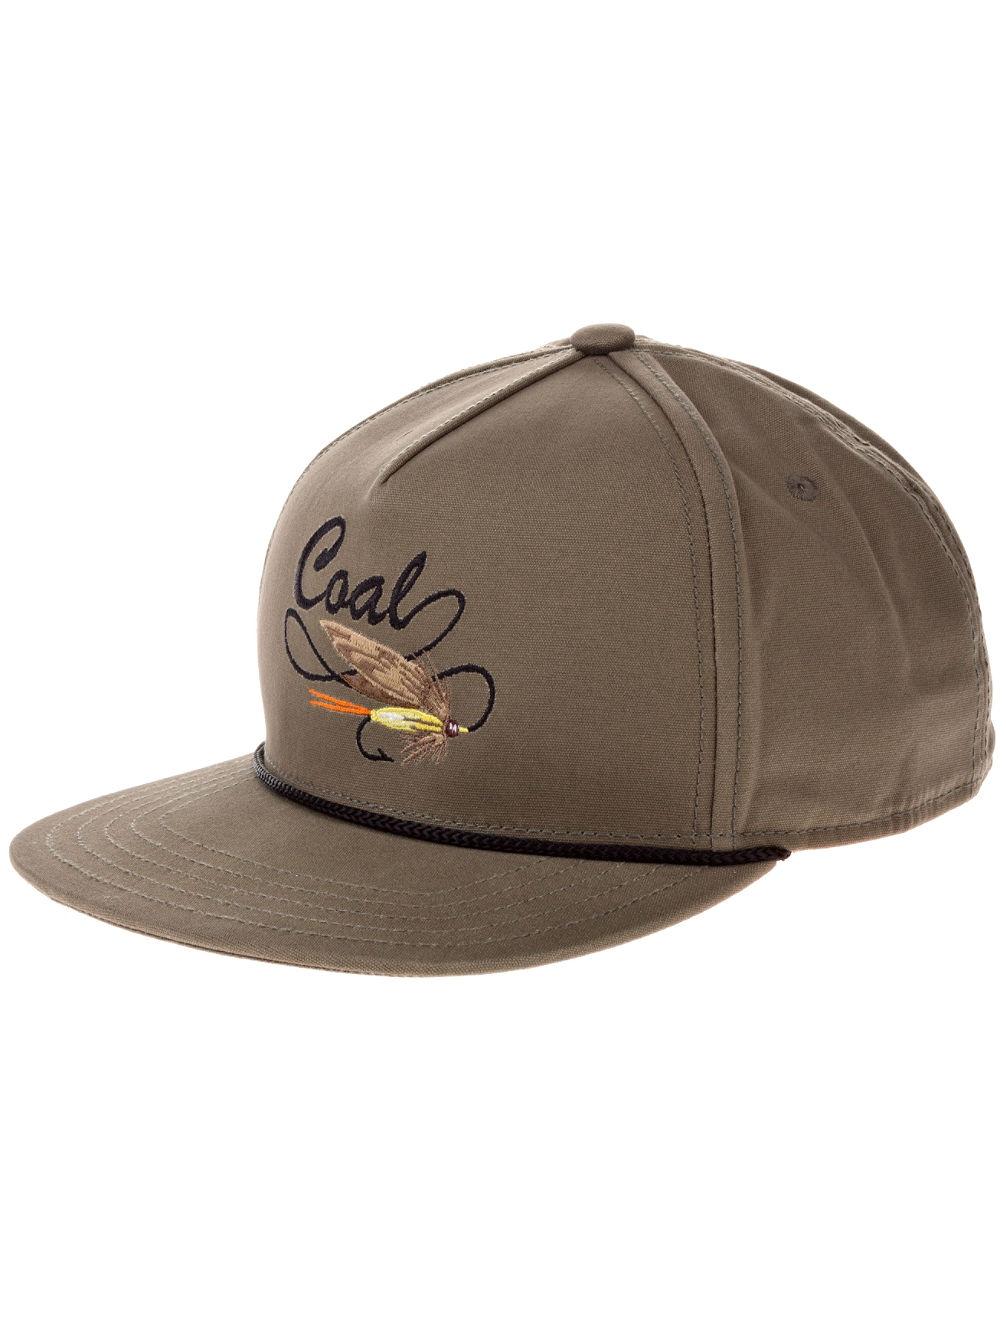 the-angler-cap